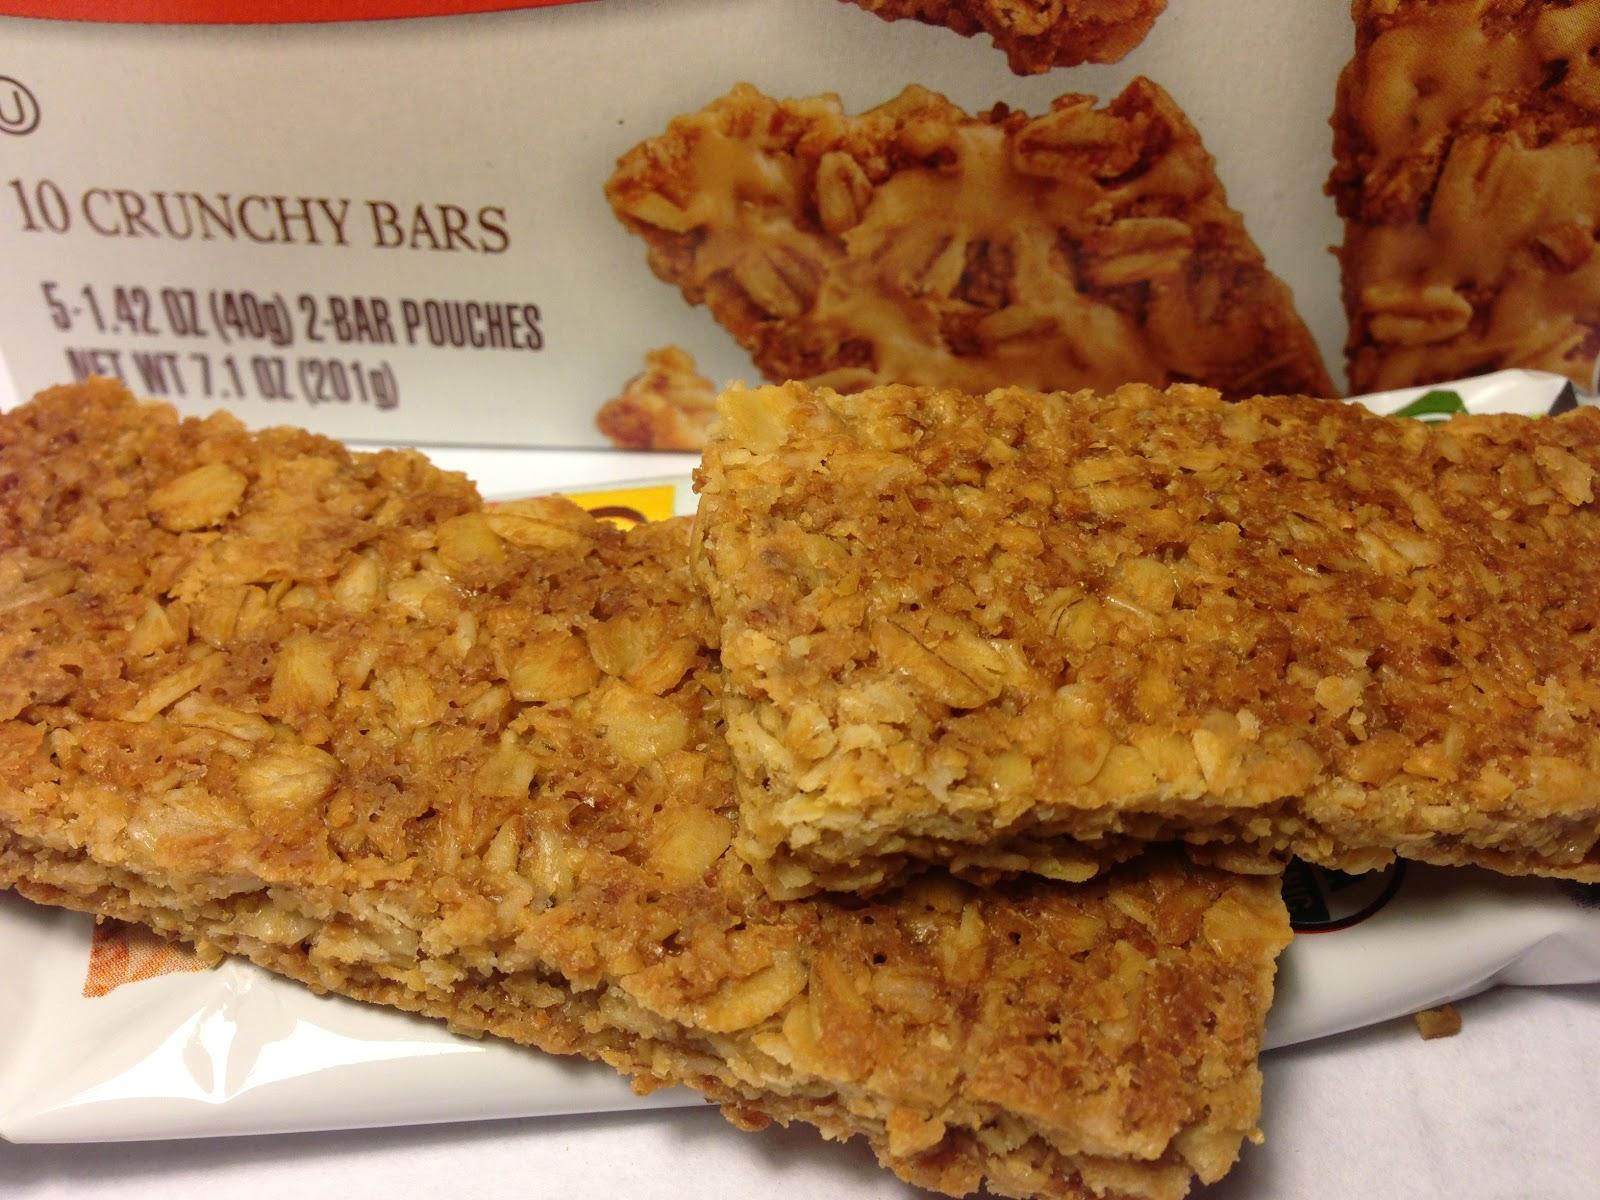 Cascadian Farm Organic Crunchy Peanut Butter Granola Bars